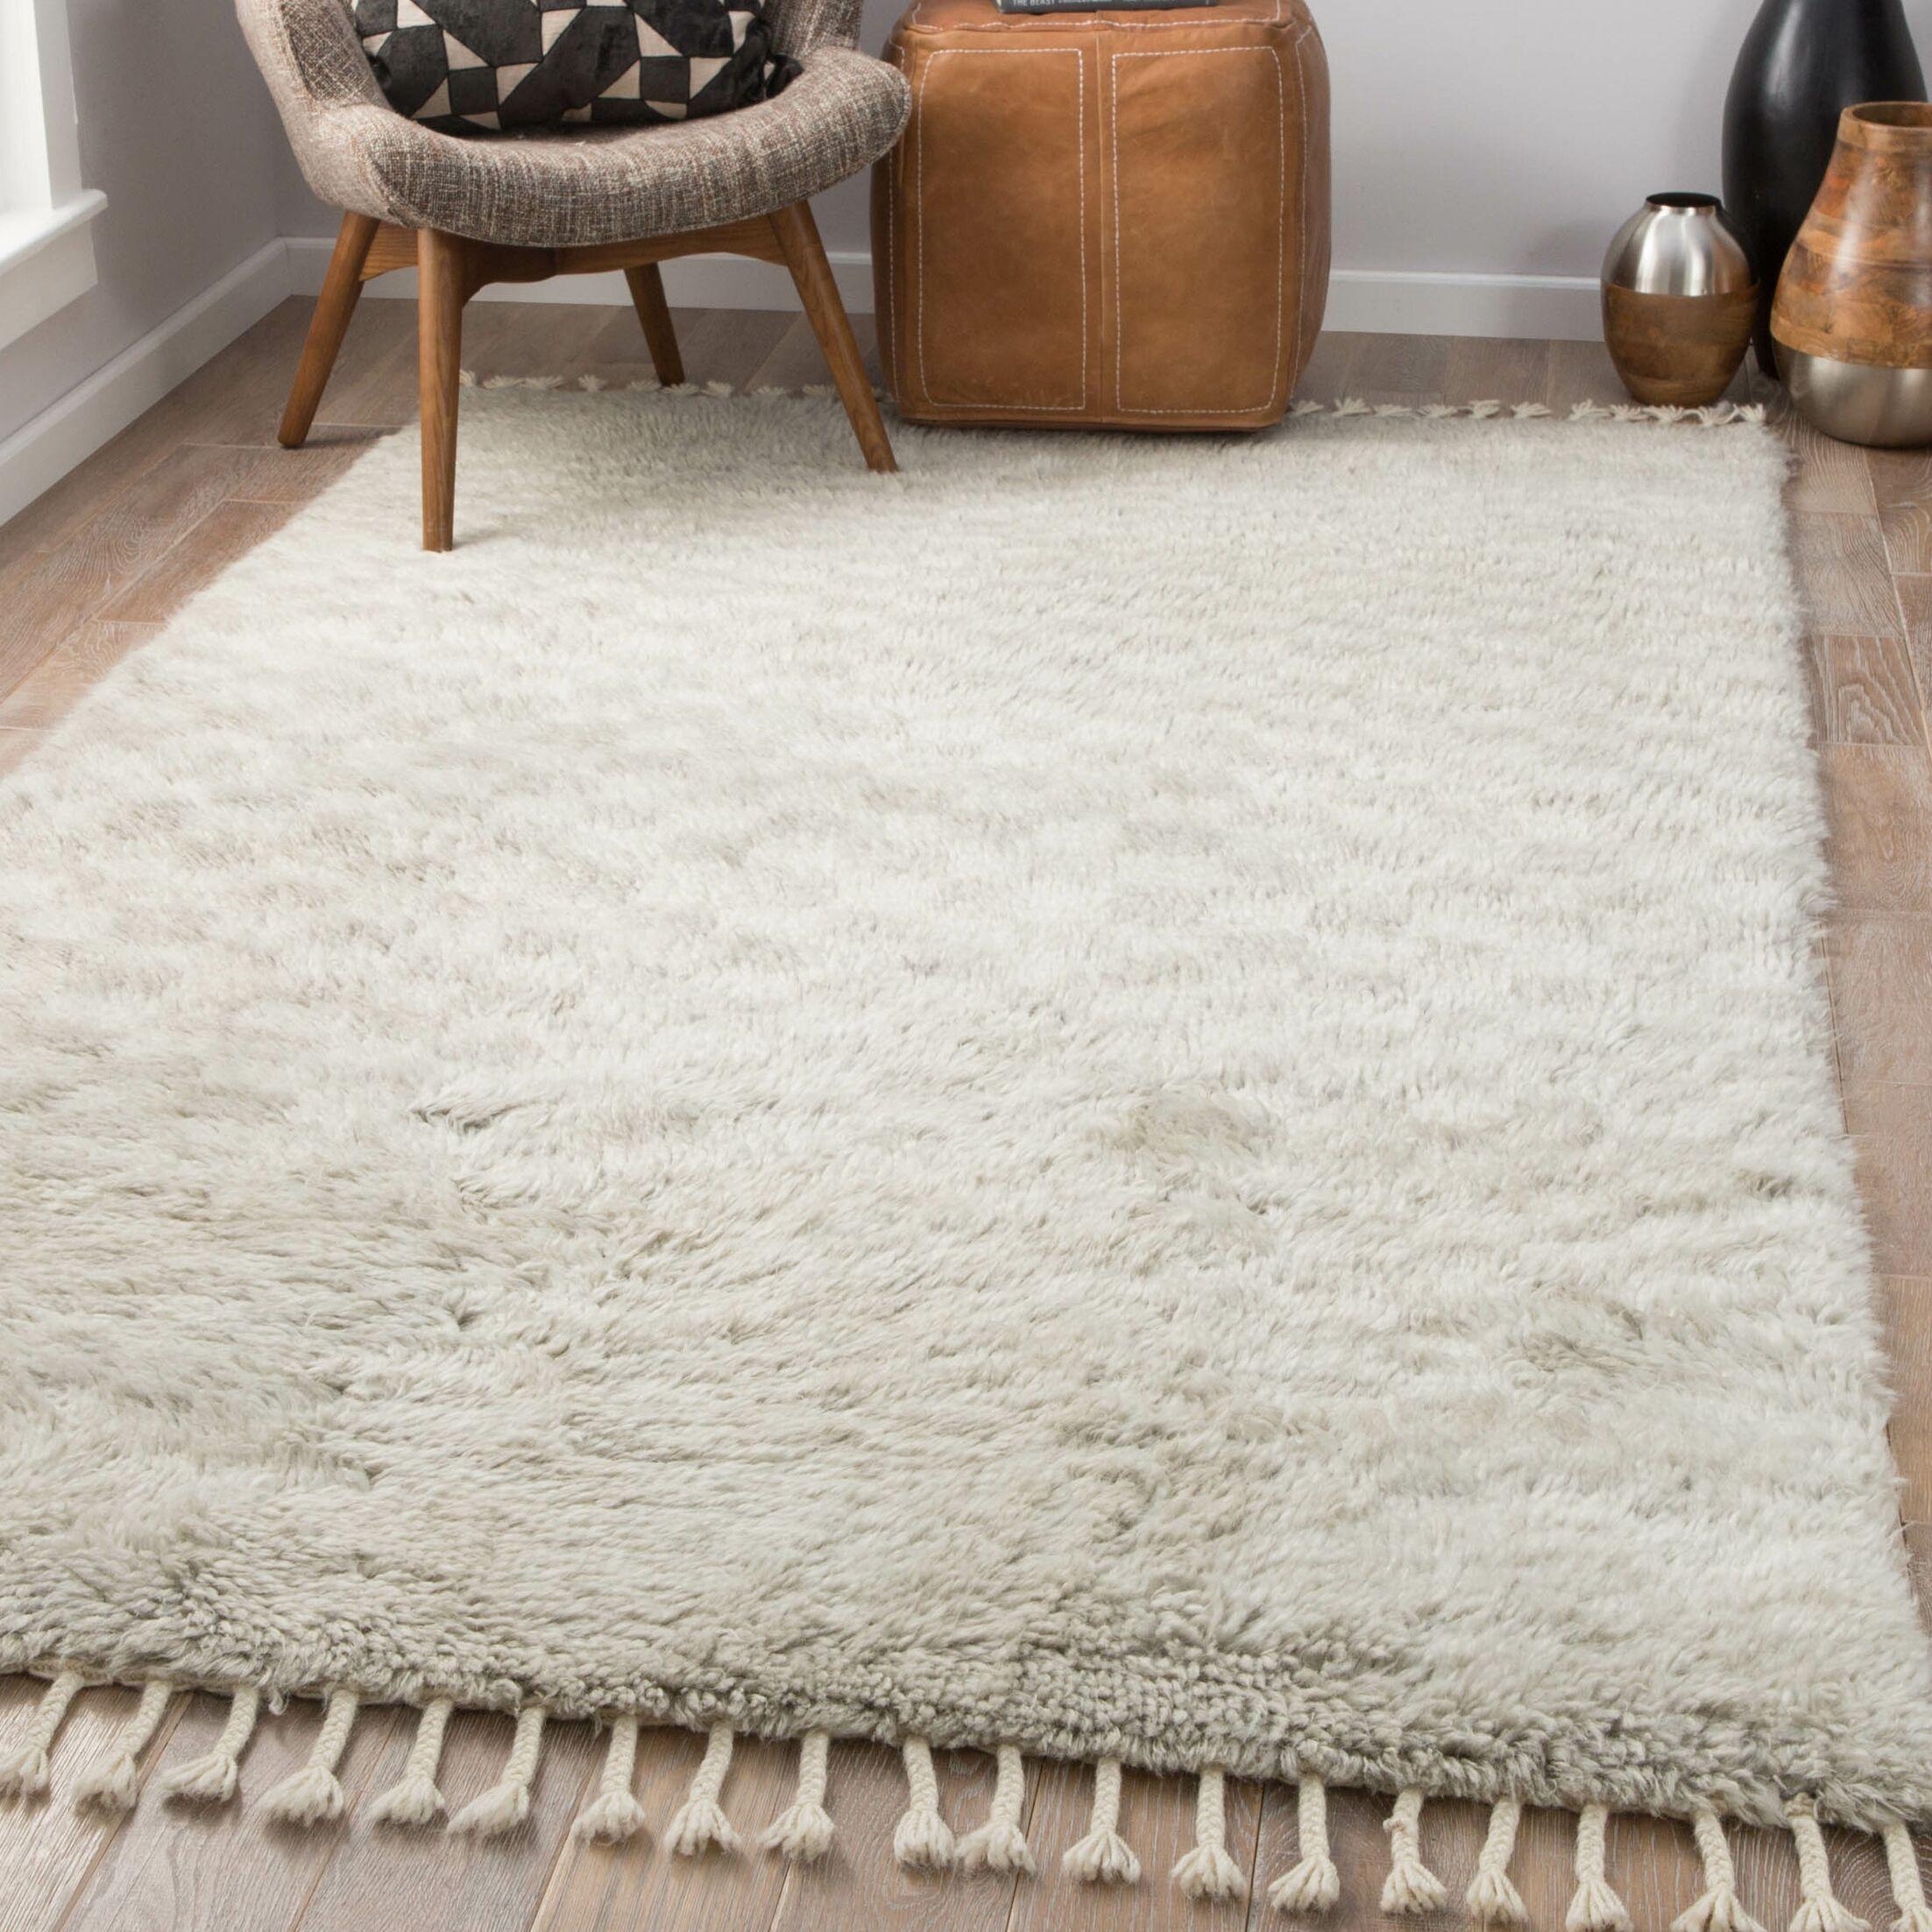 Majewski Hand-Knotted Wool Dawn Blue/London Fog Area Rug Rug Size: Rectangle 8' x 11'